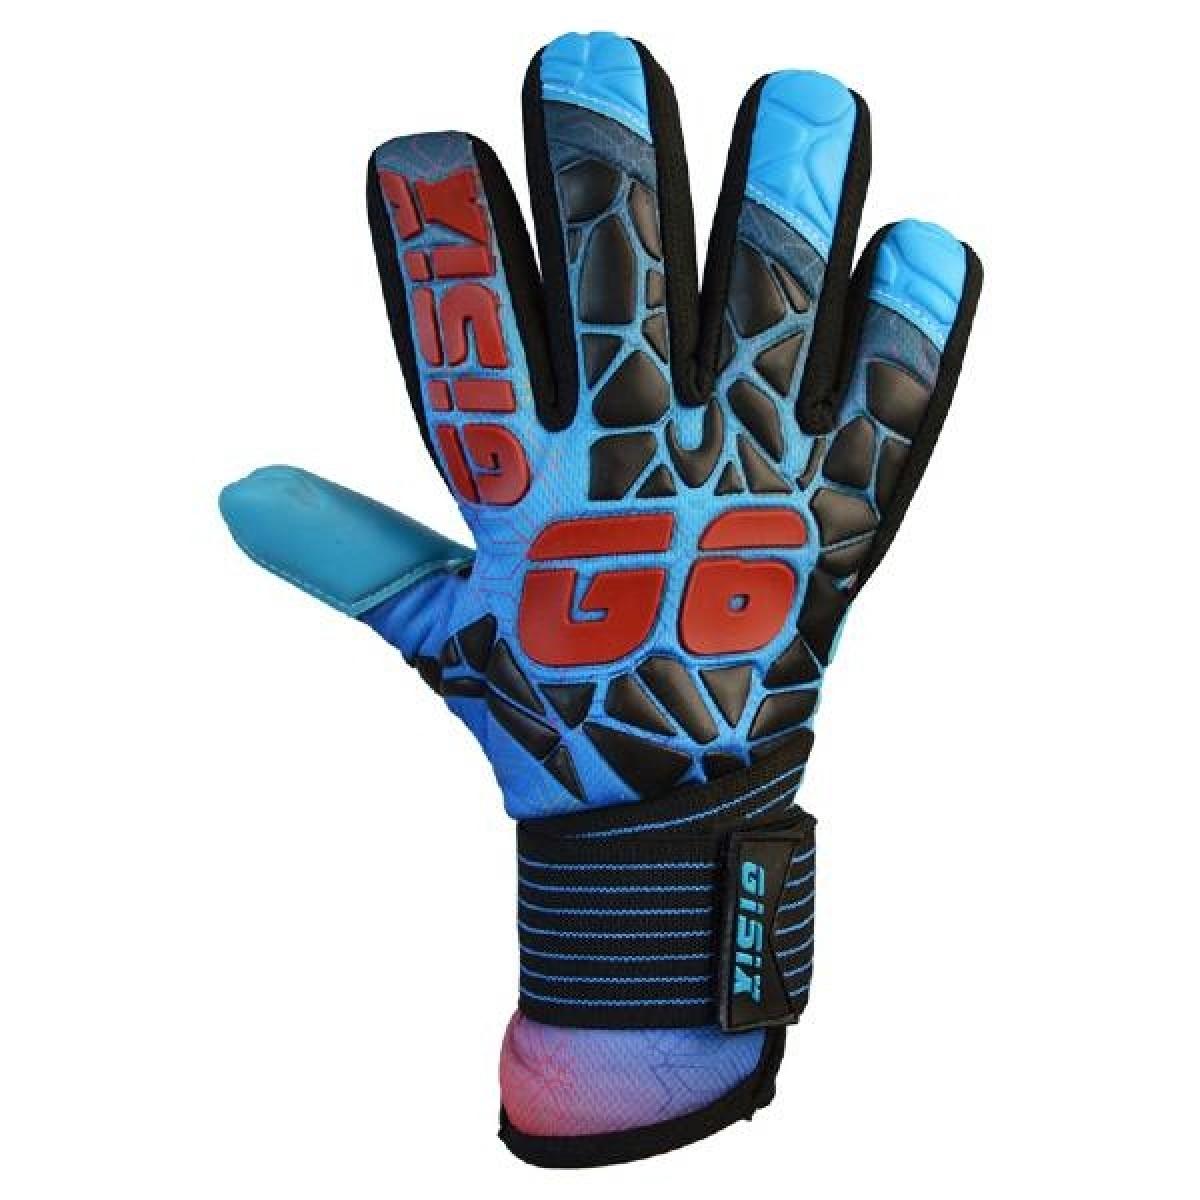 G6 G069 1